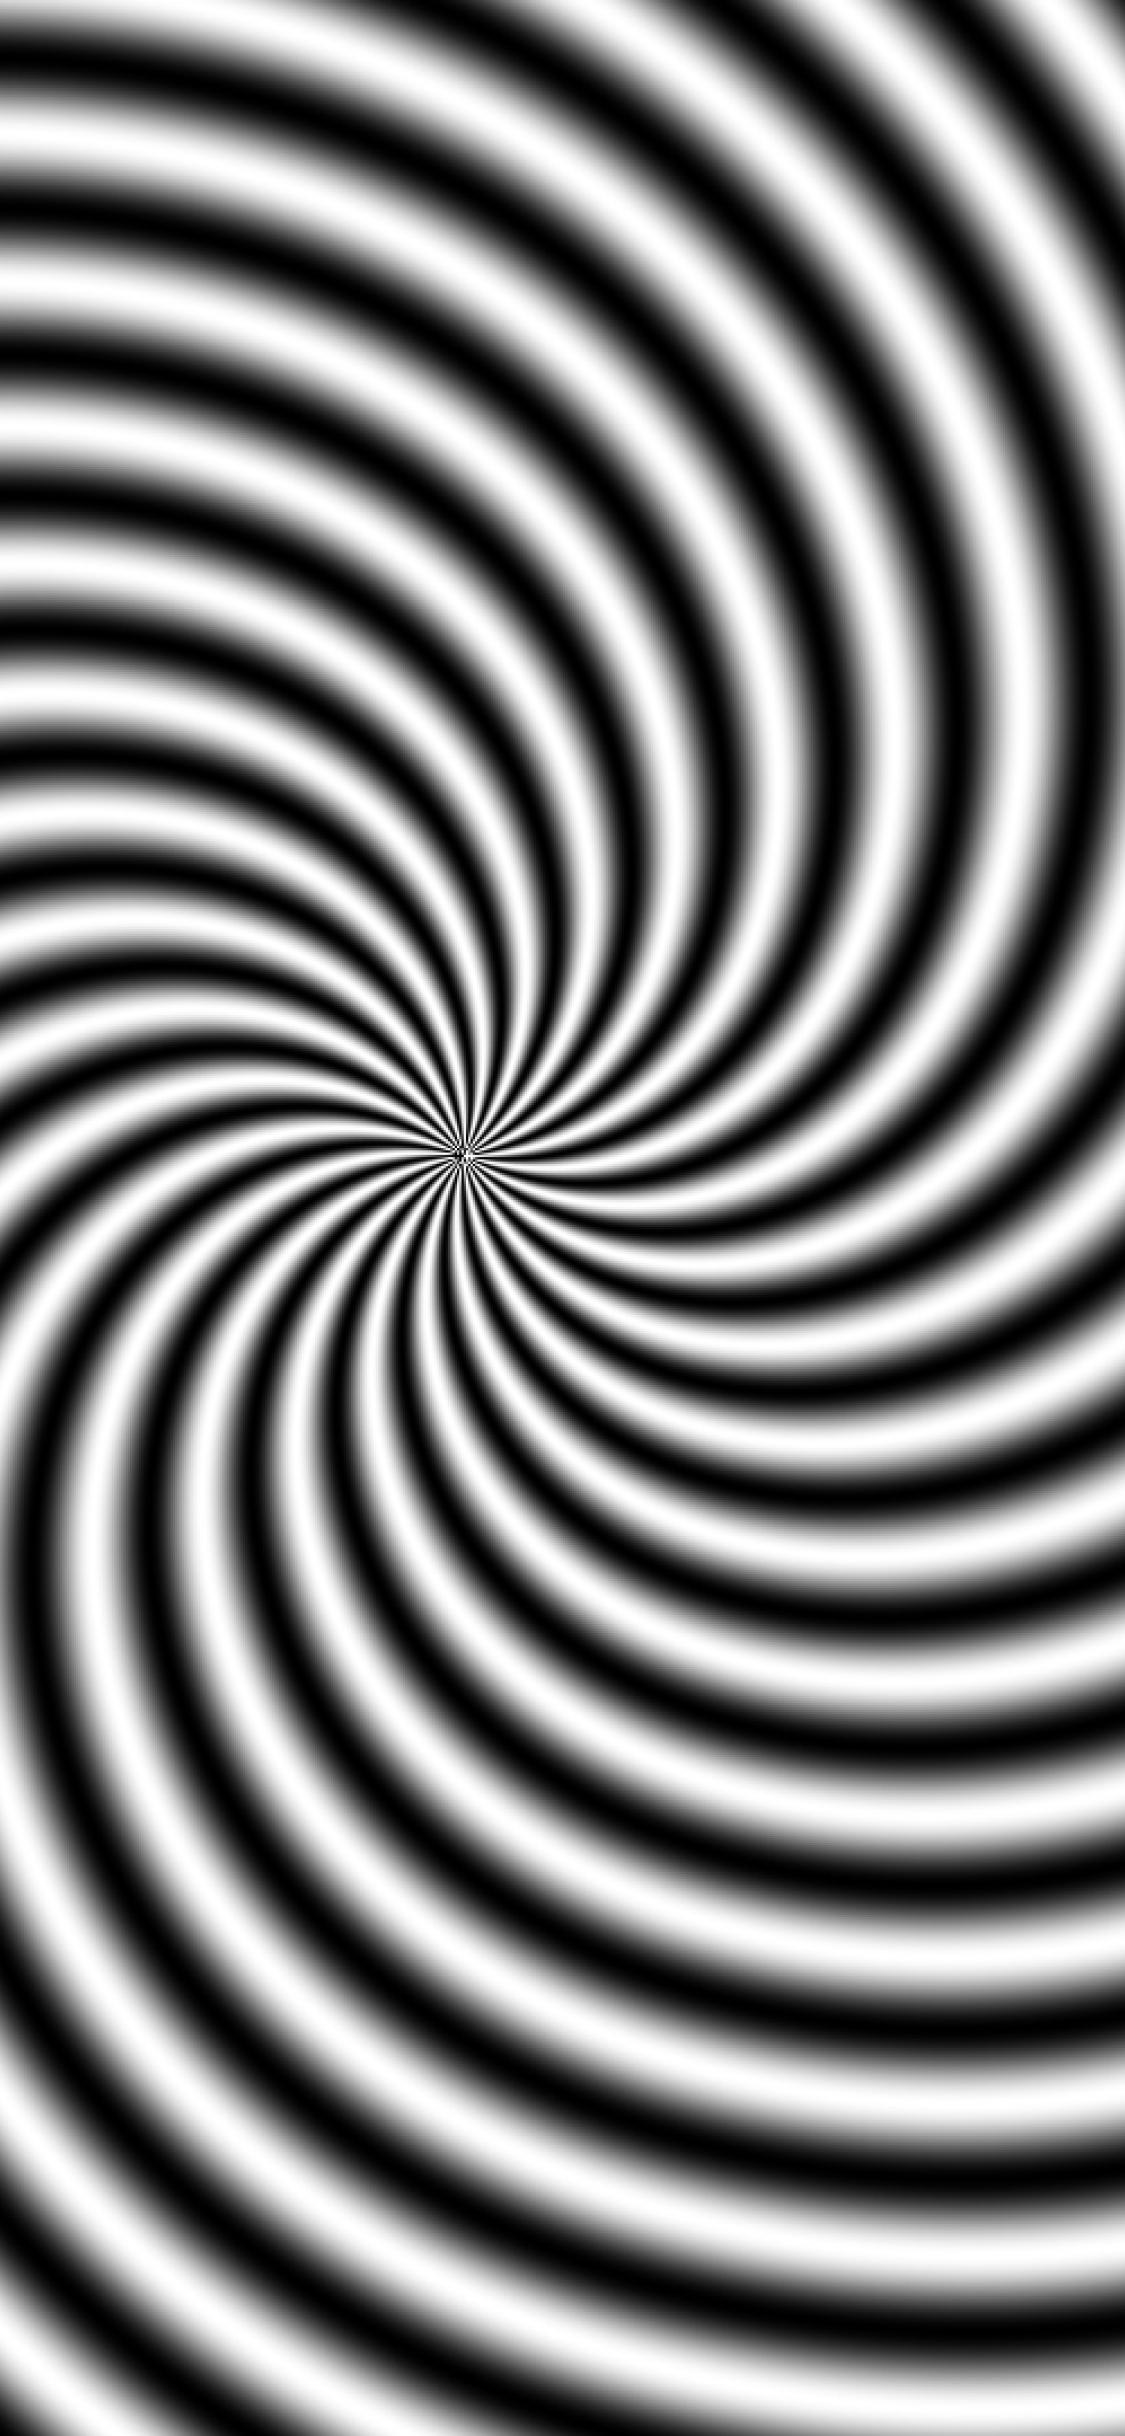 1125x2436 Spiral Optical Illusion Iphone XS,Iphone 10 ...